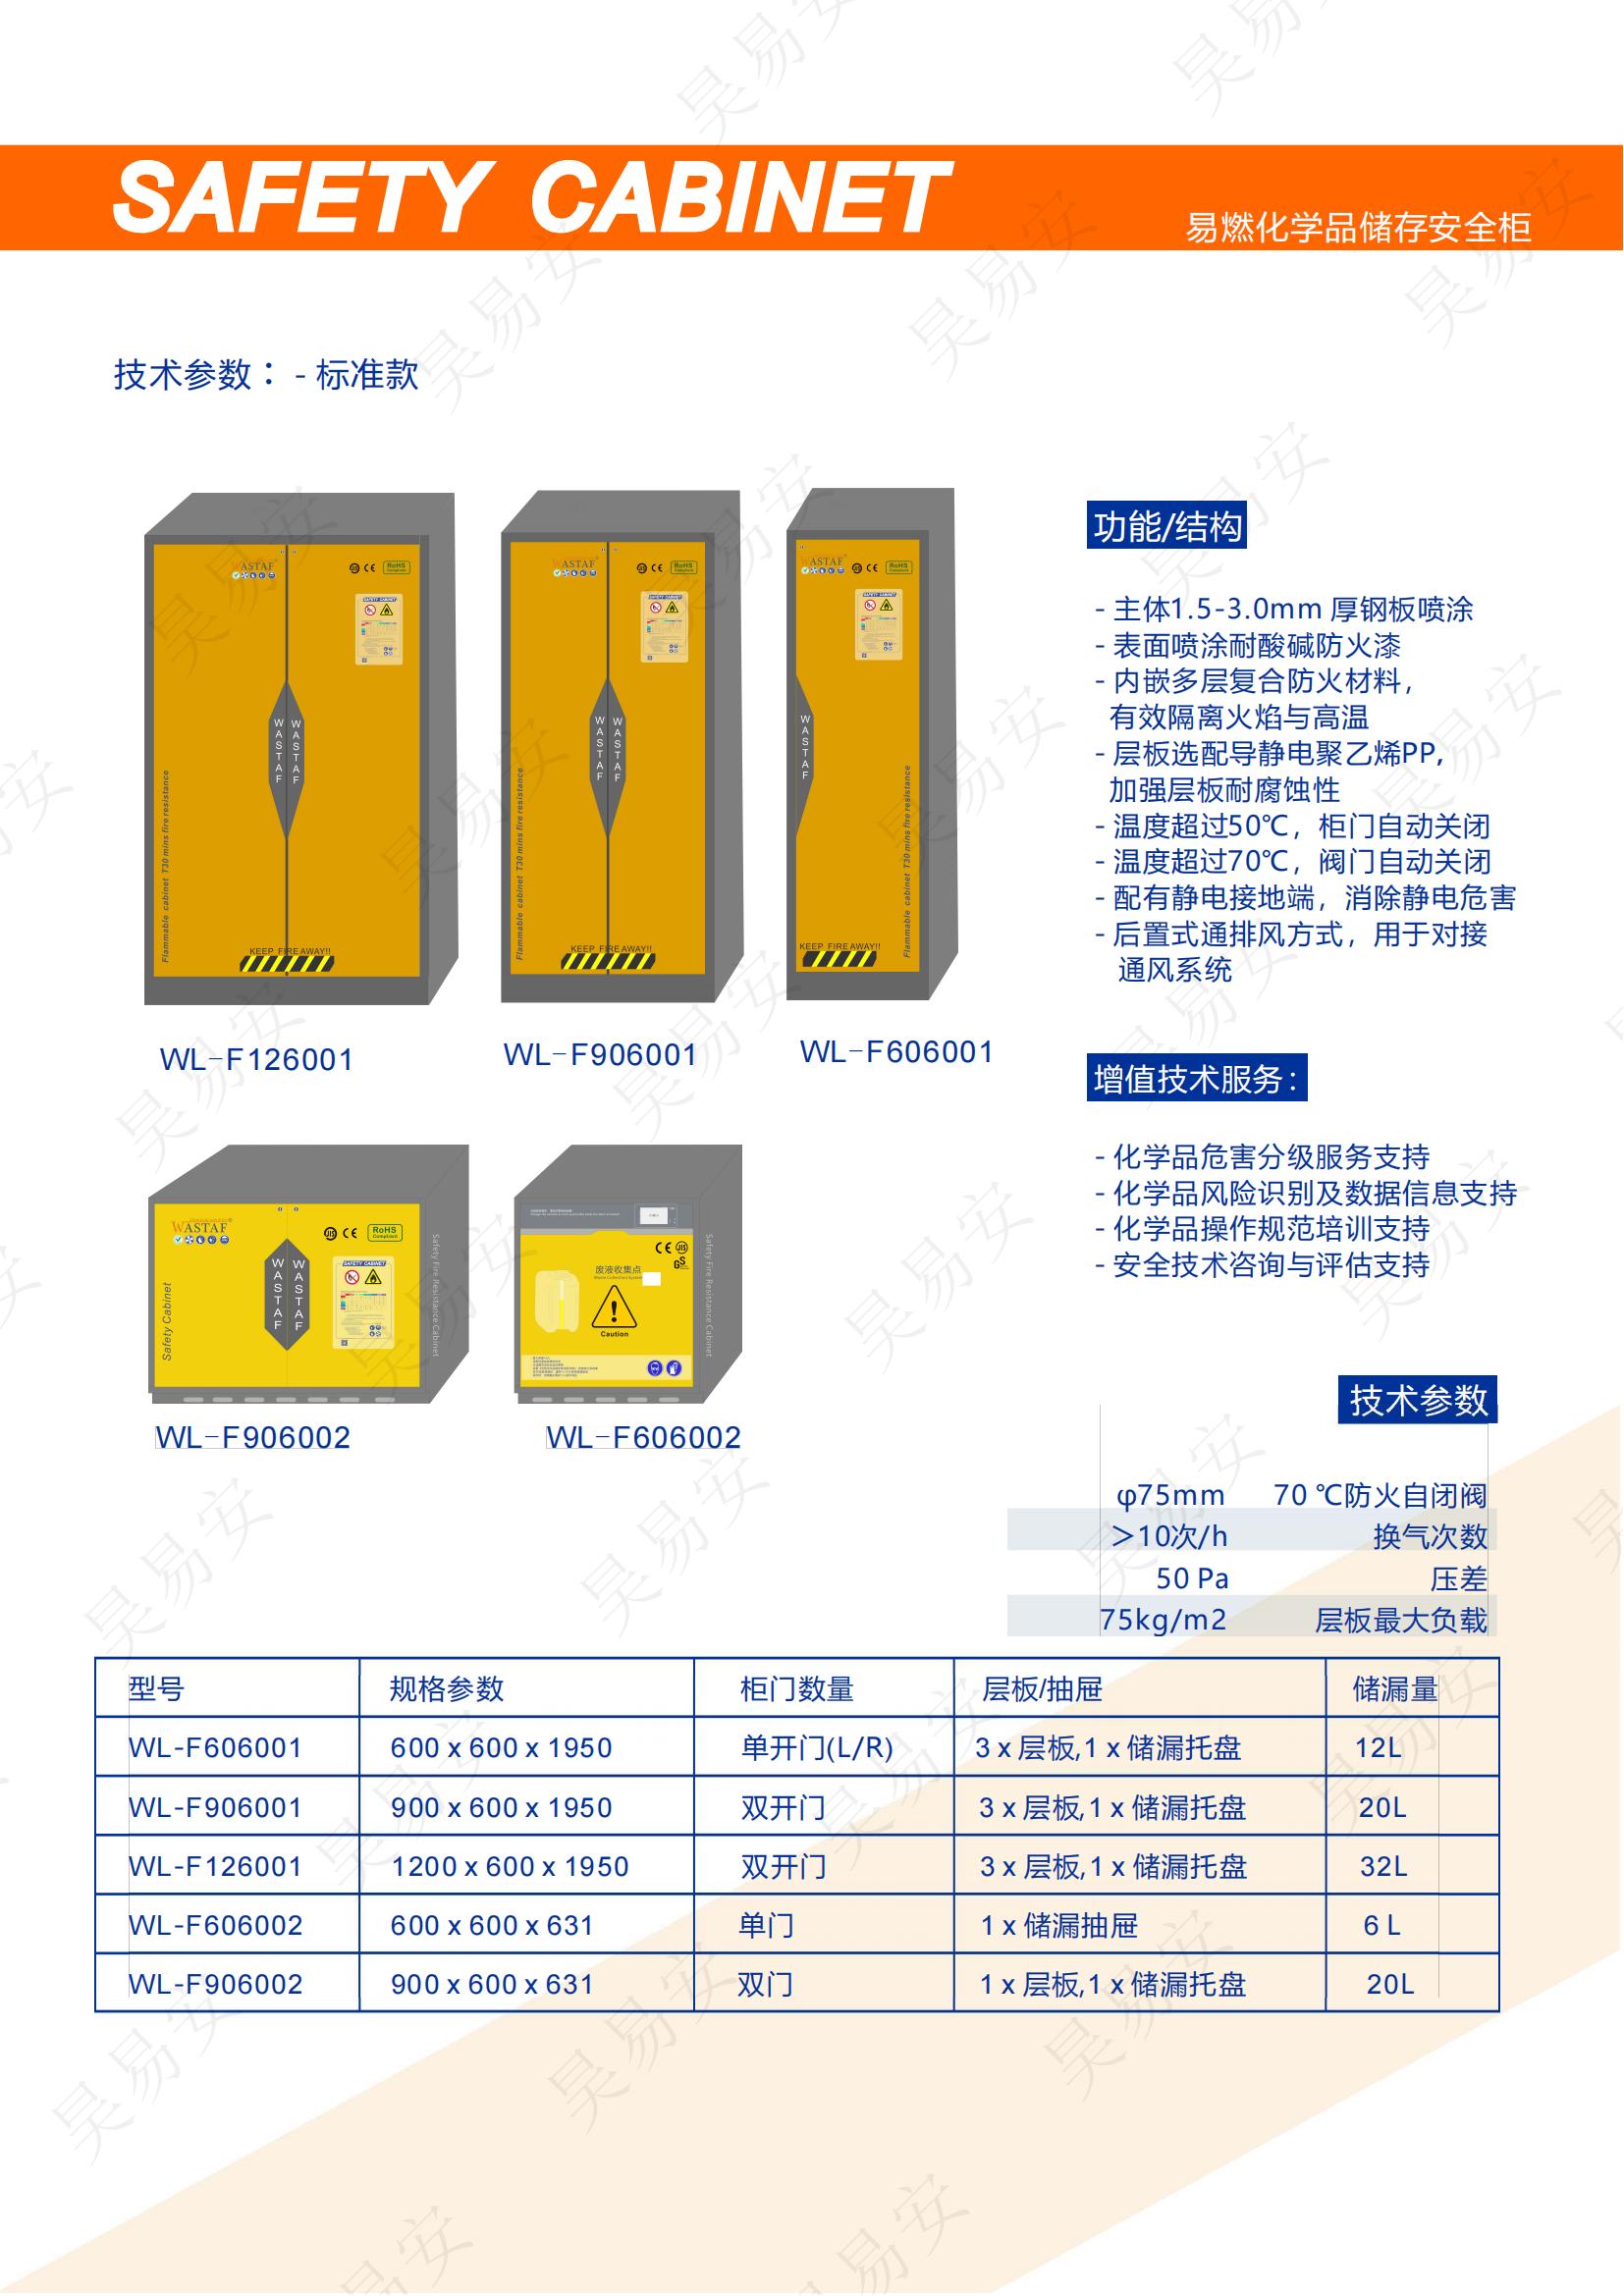 WASTAF 产品目录(1)昊易安_02.png